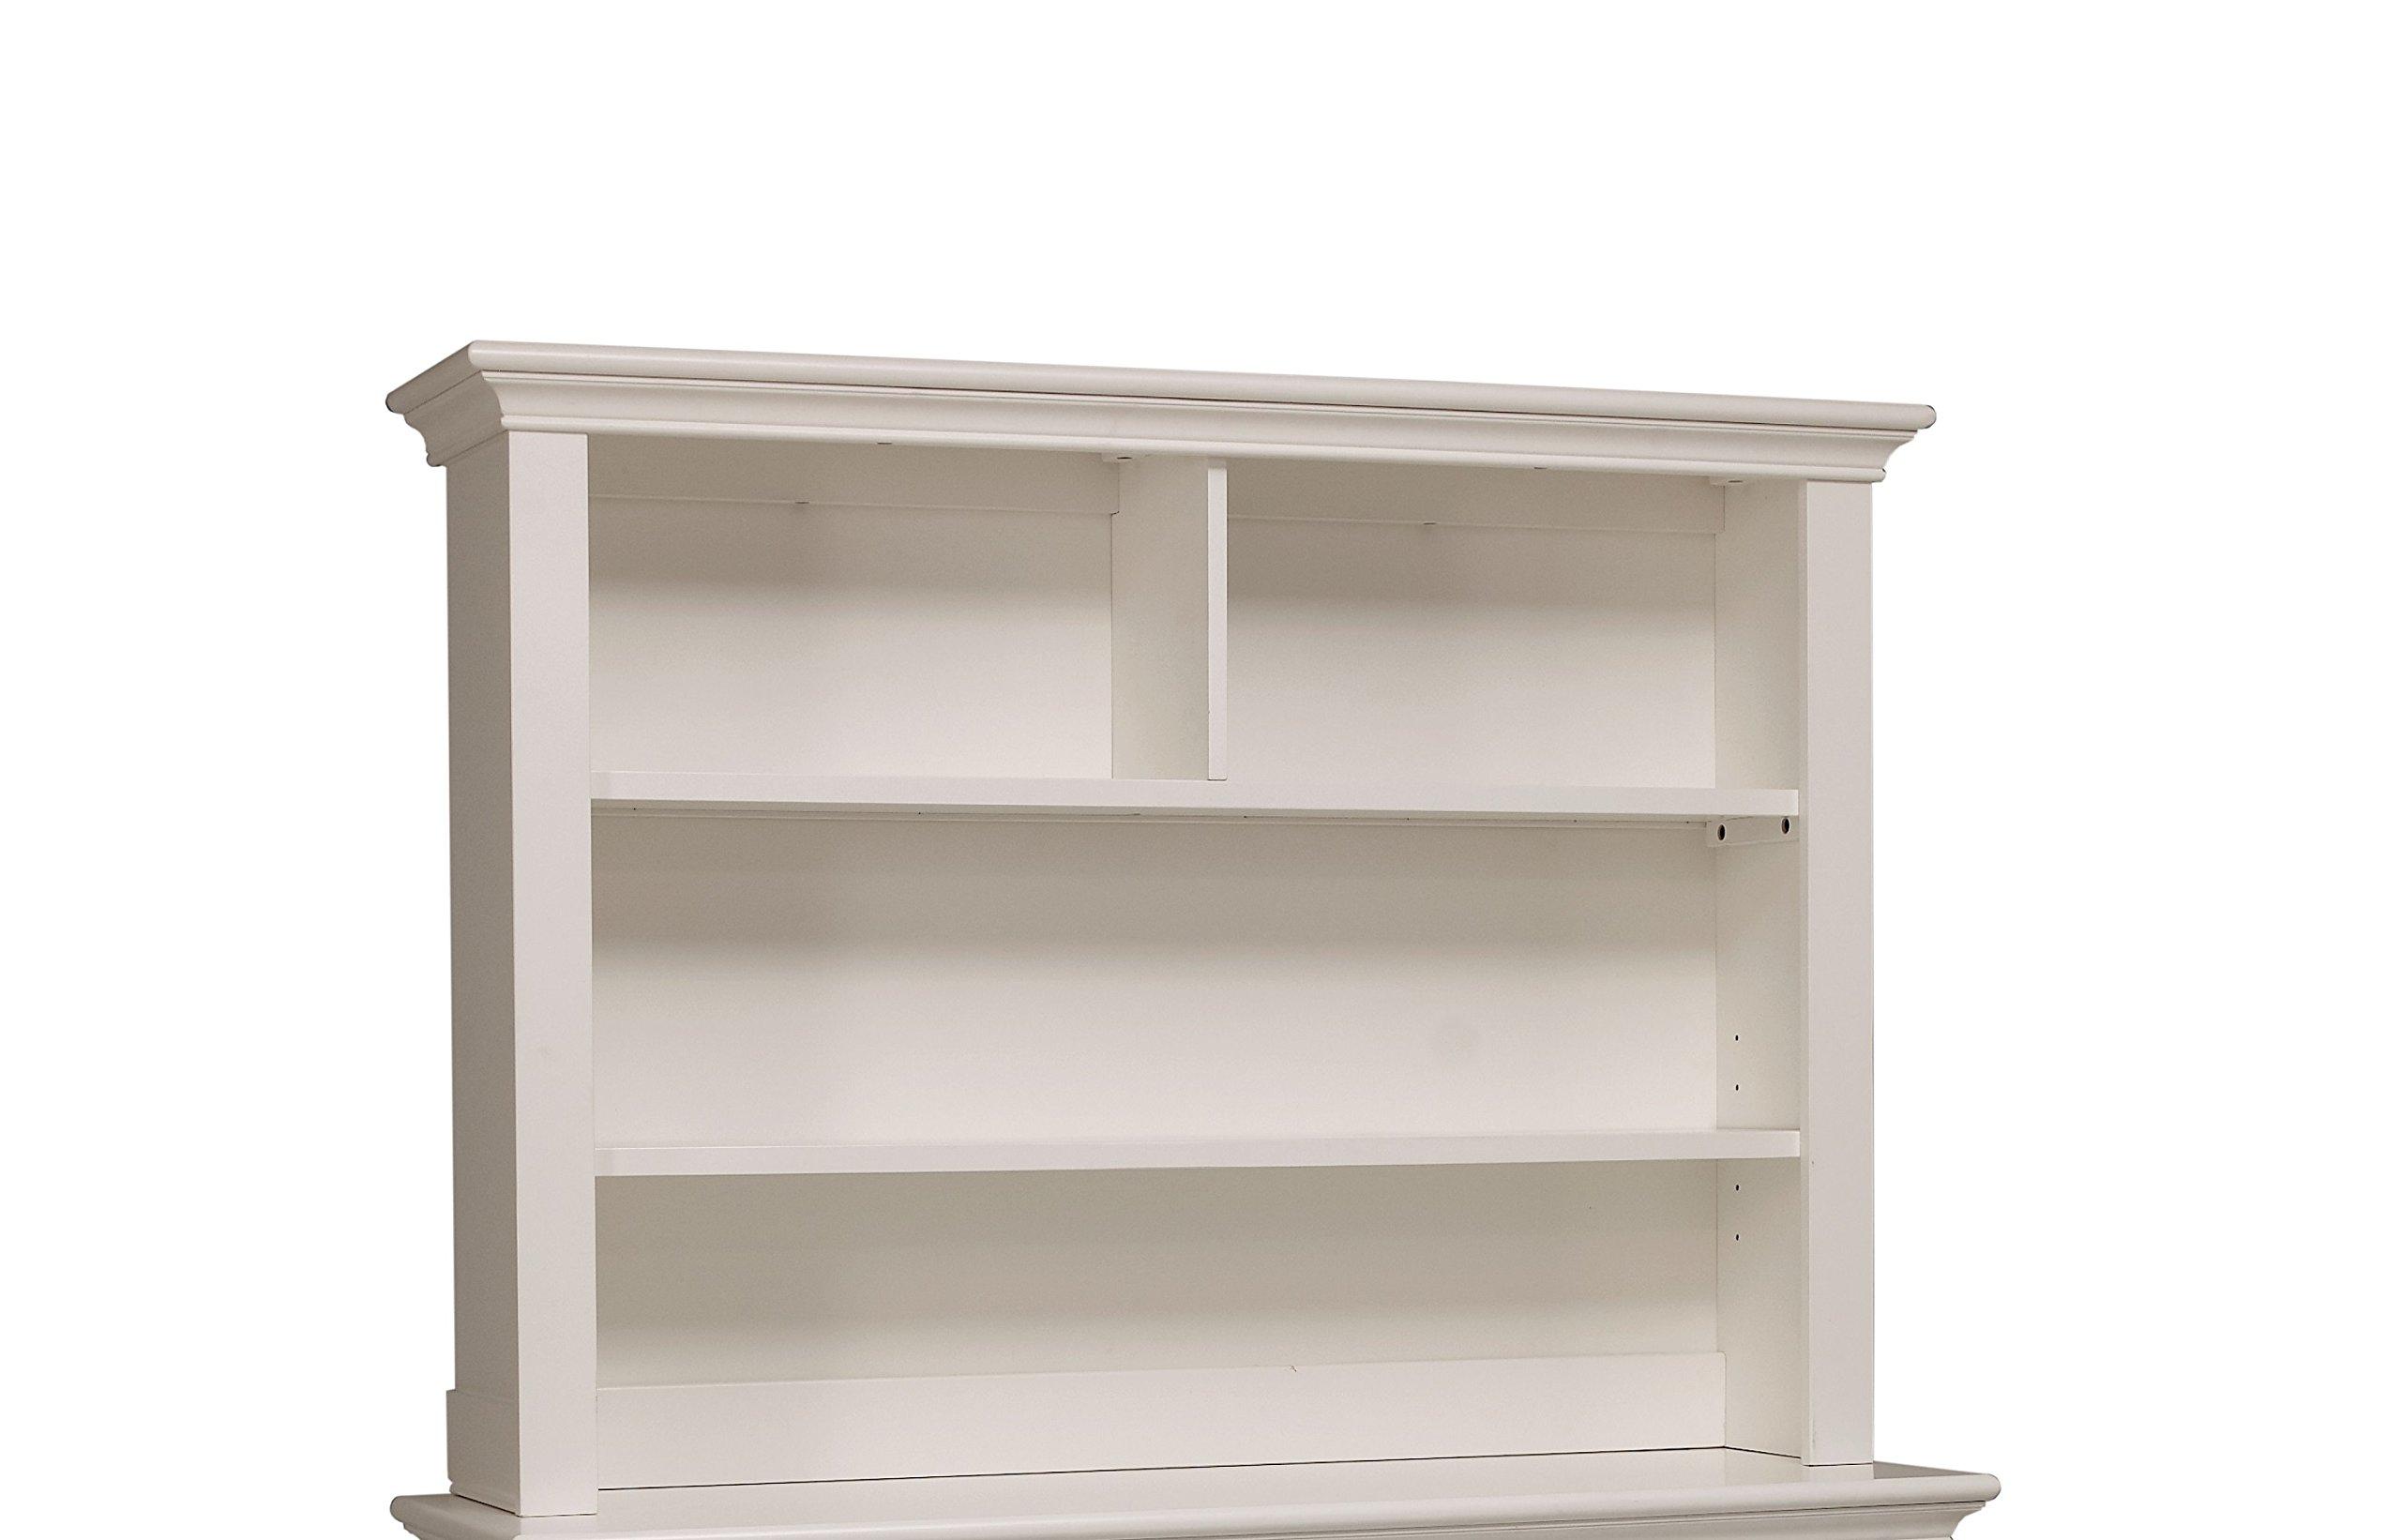 Centennial Medford Hutch- White